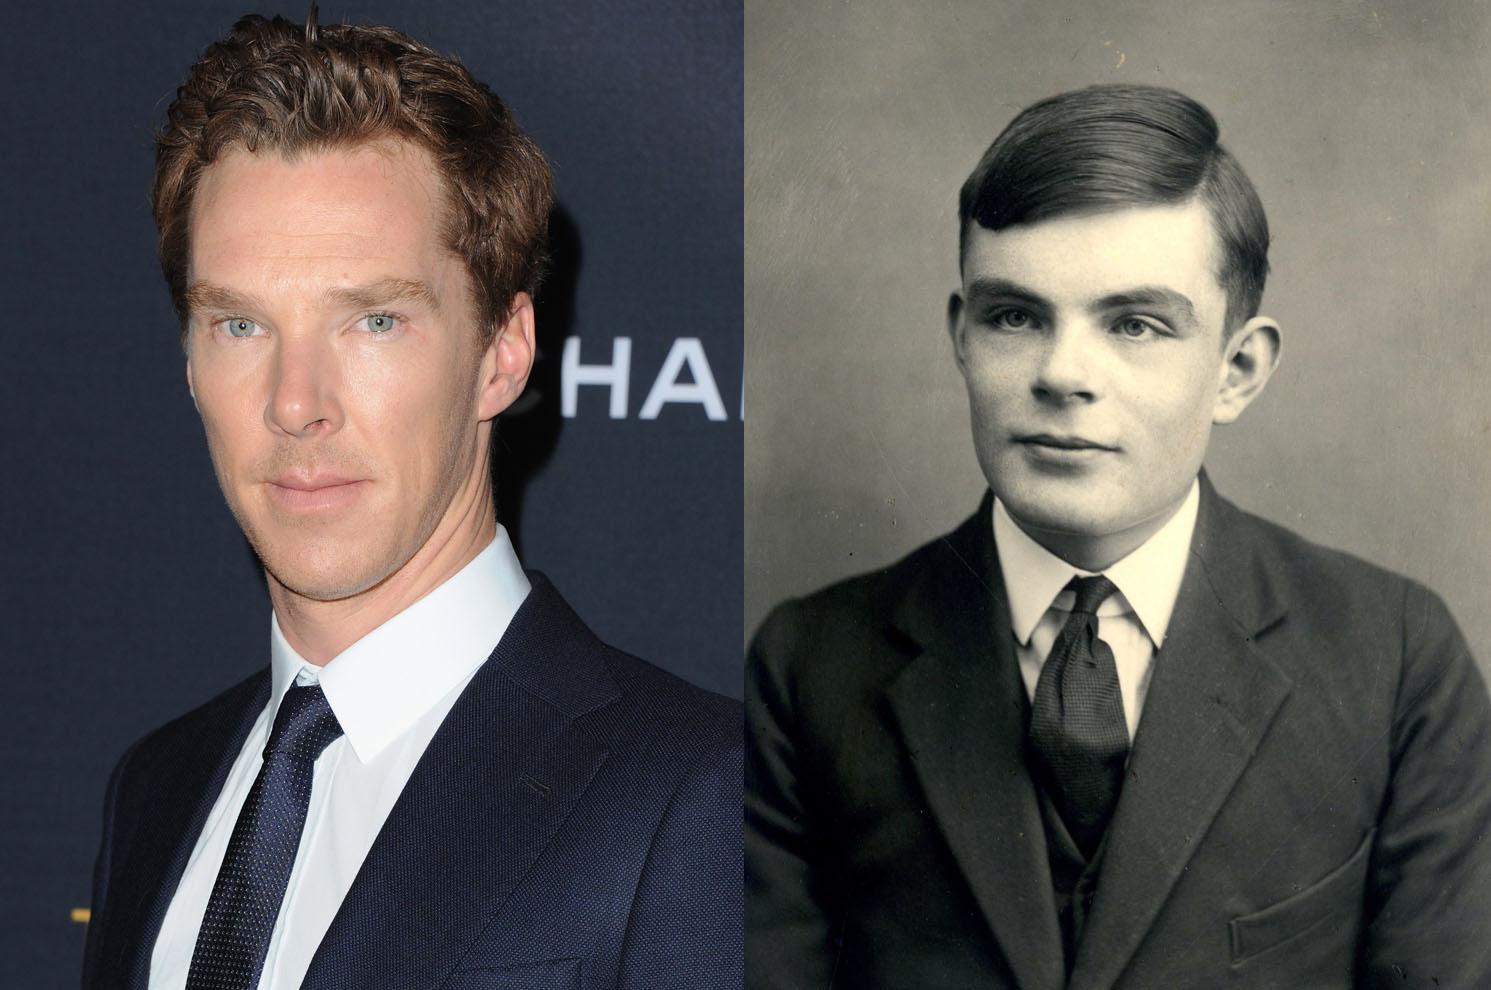 Benedict Cumberbatch and Alan Turing.